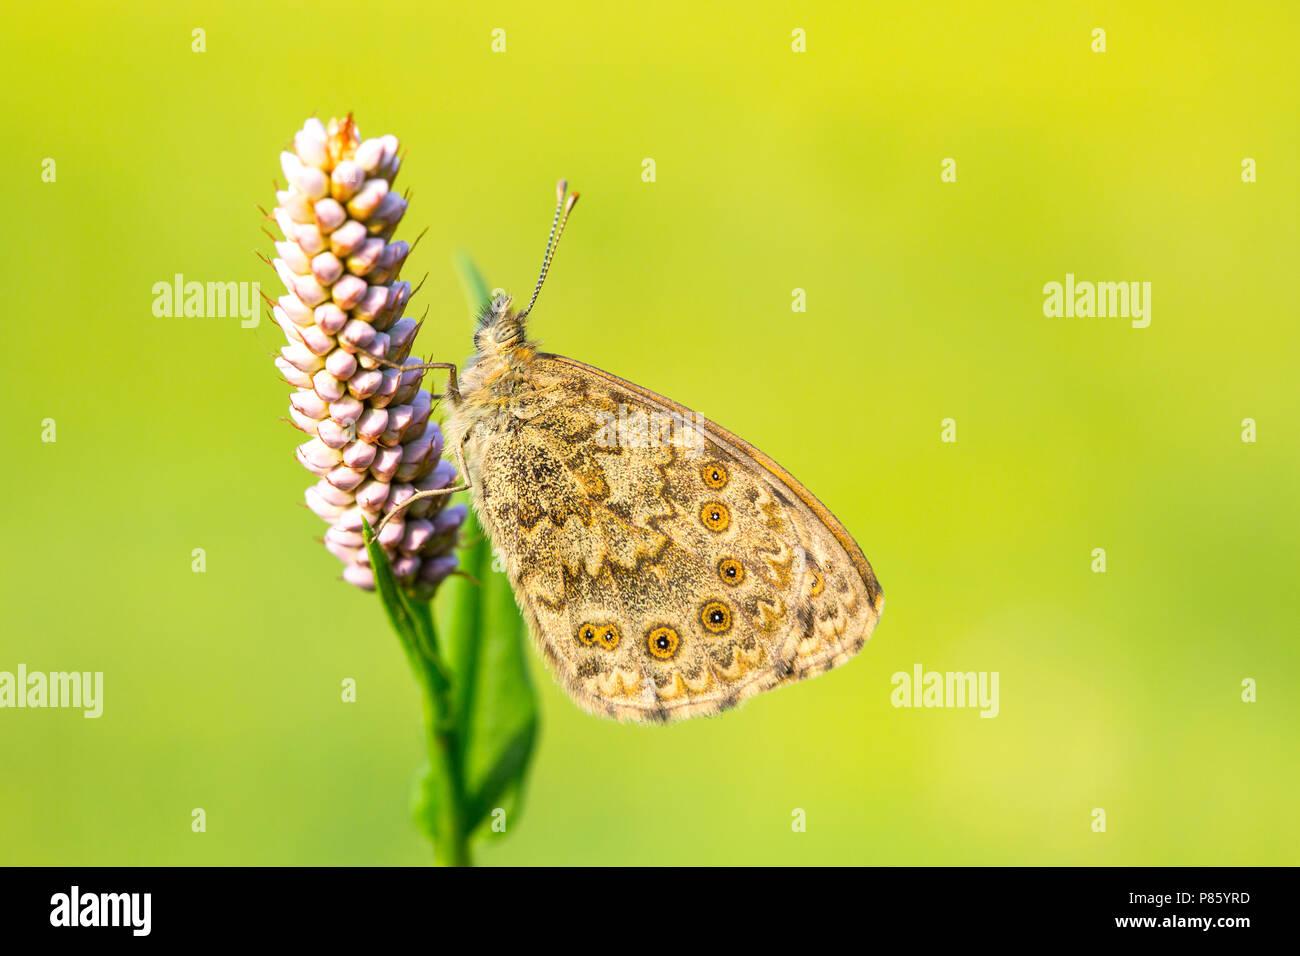 Argusvlinder, Wall Brown - Stock Image